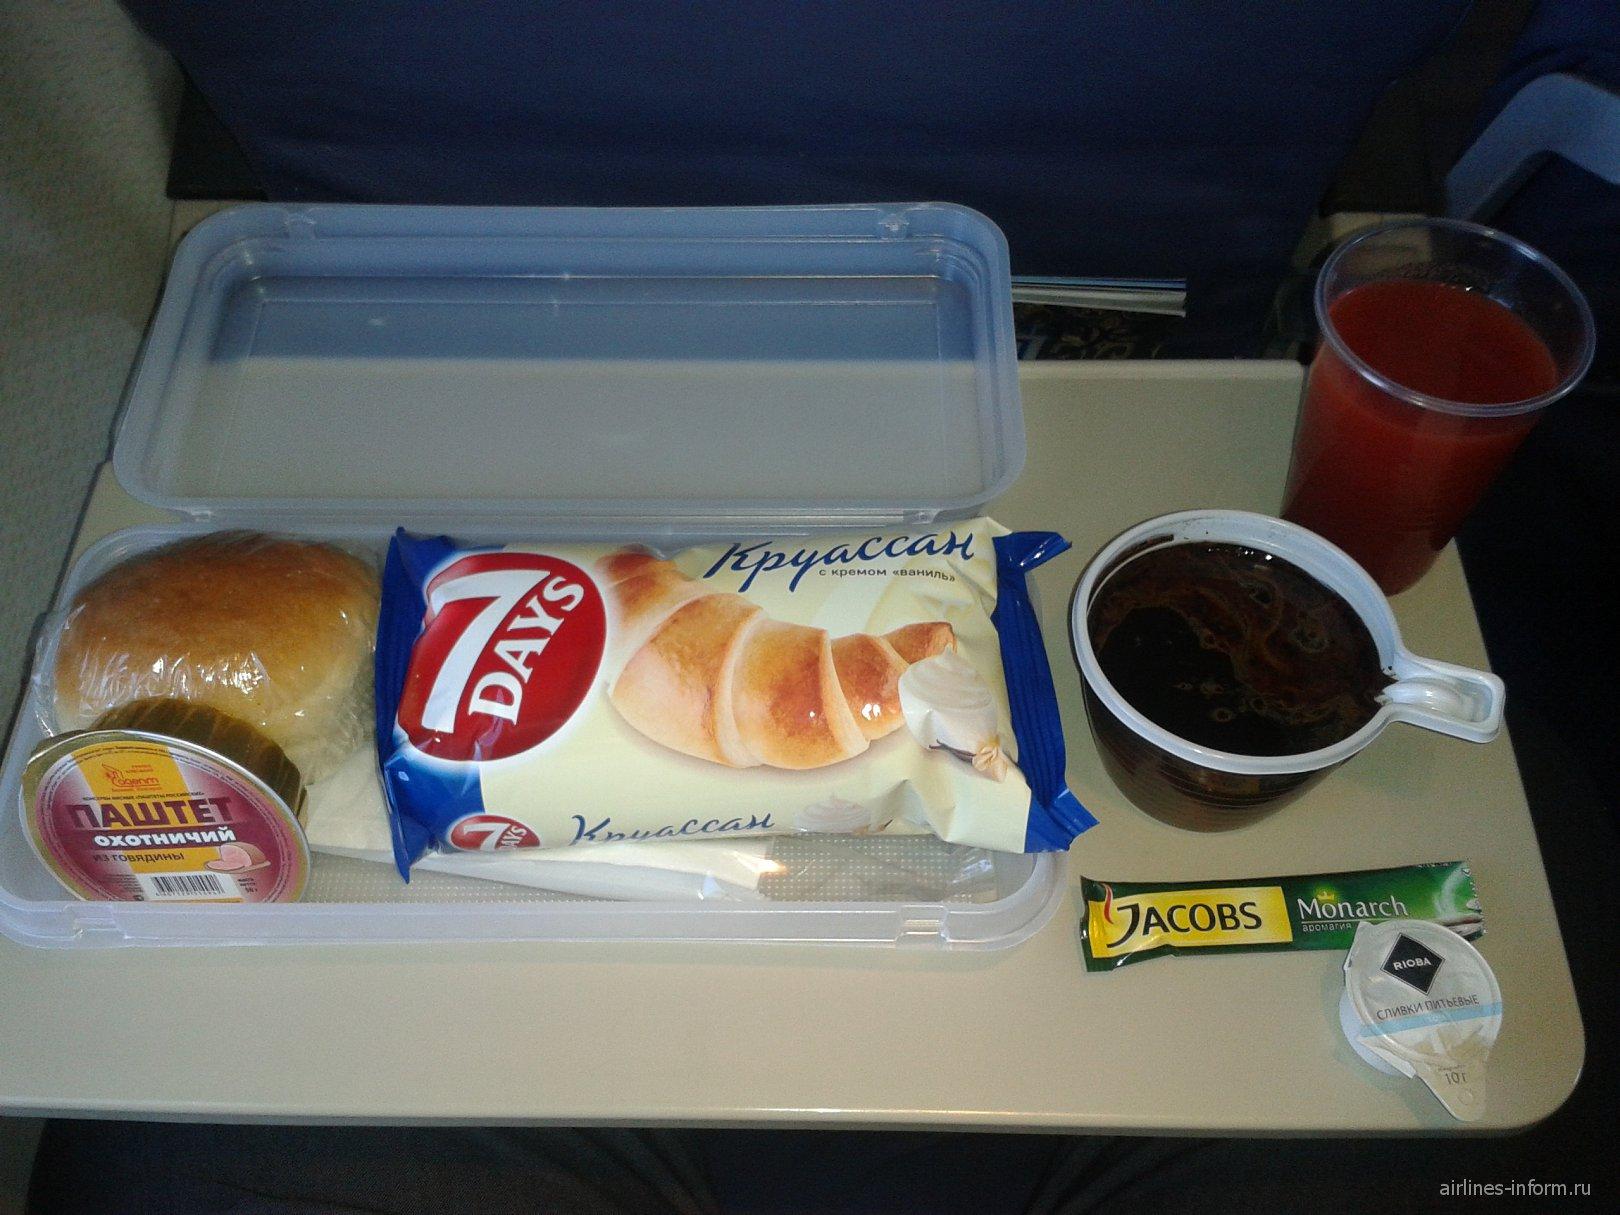 Питание на рейсе Москва-Бугульма авиакомпании ЮВТ-аэро